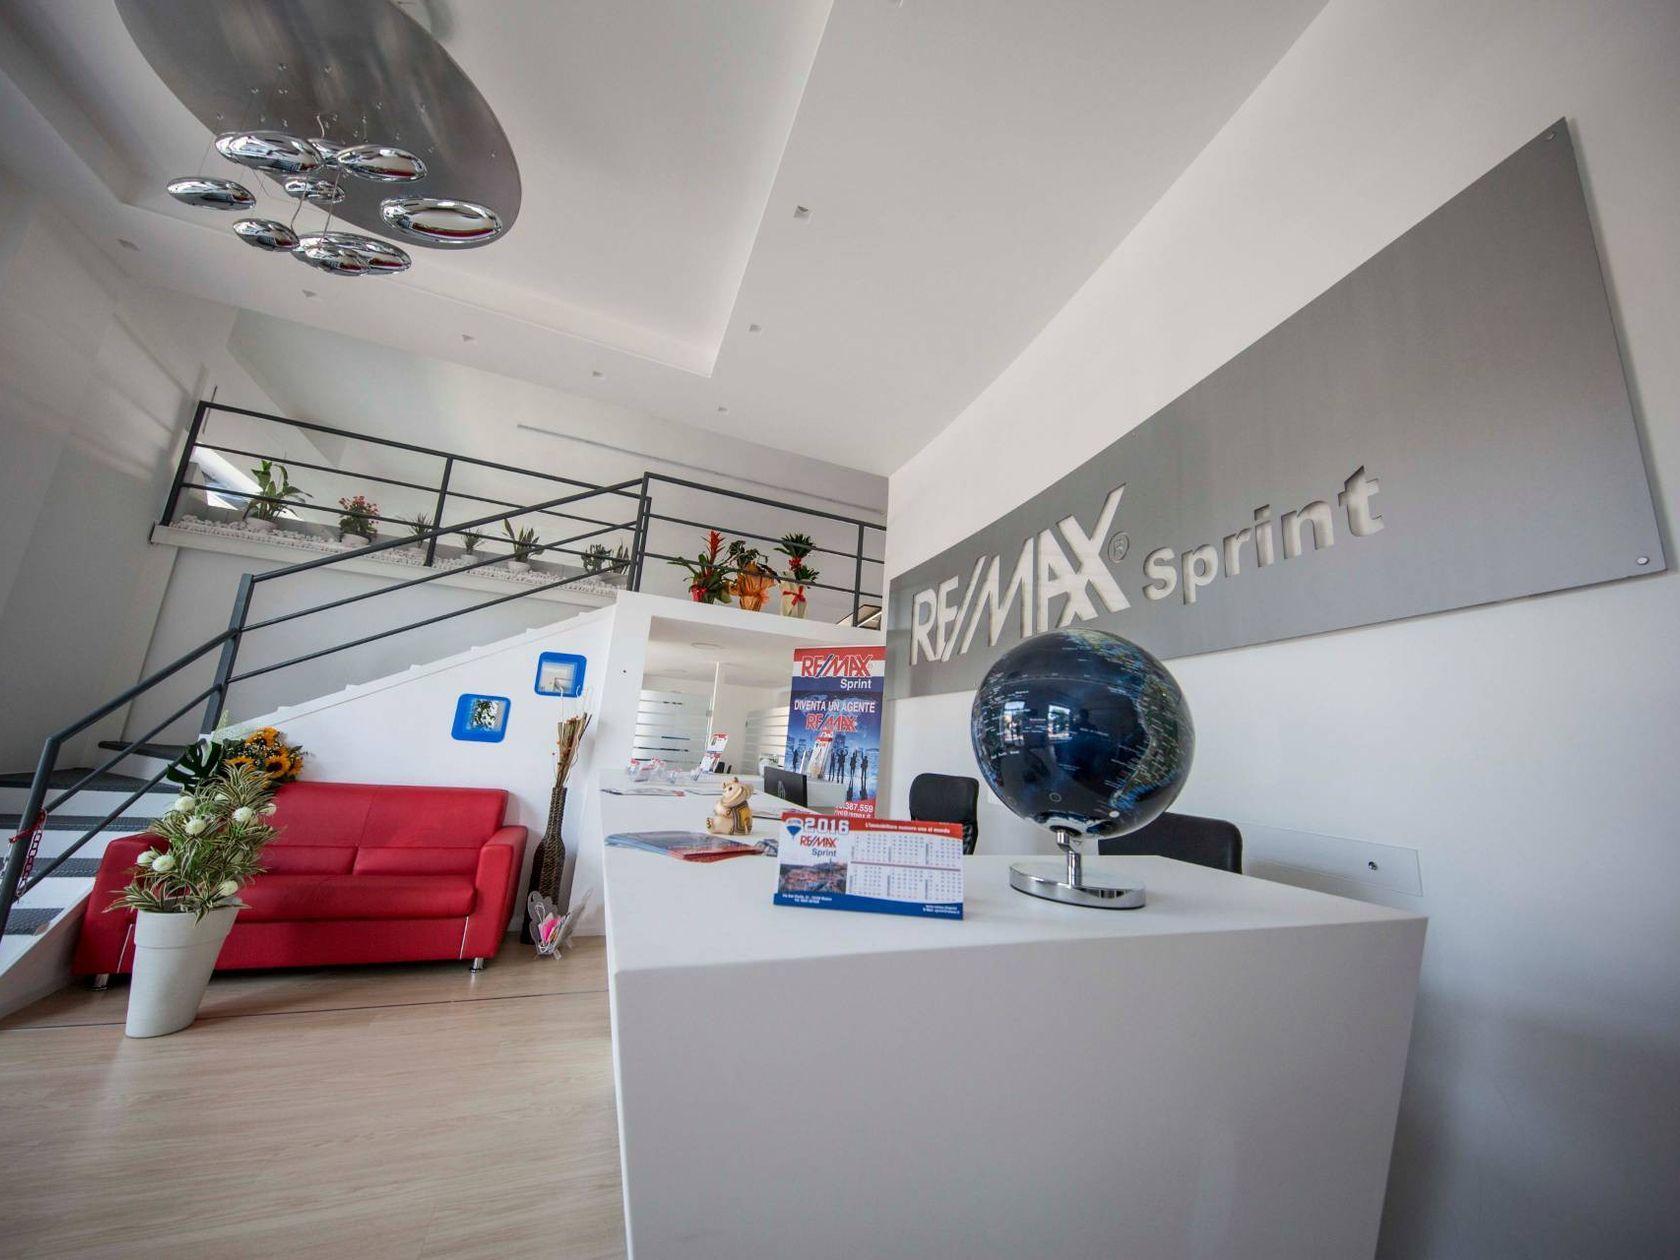 RE/MAX Sprint Matera - Foto 4